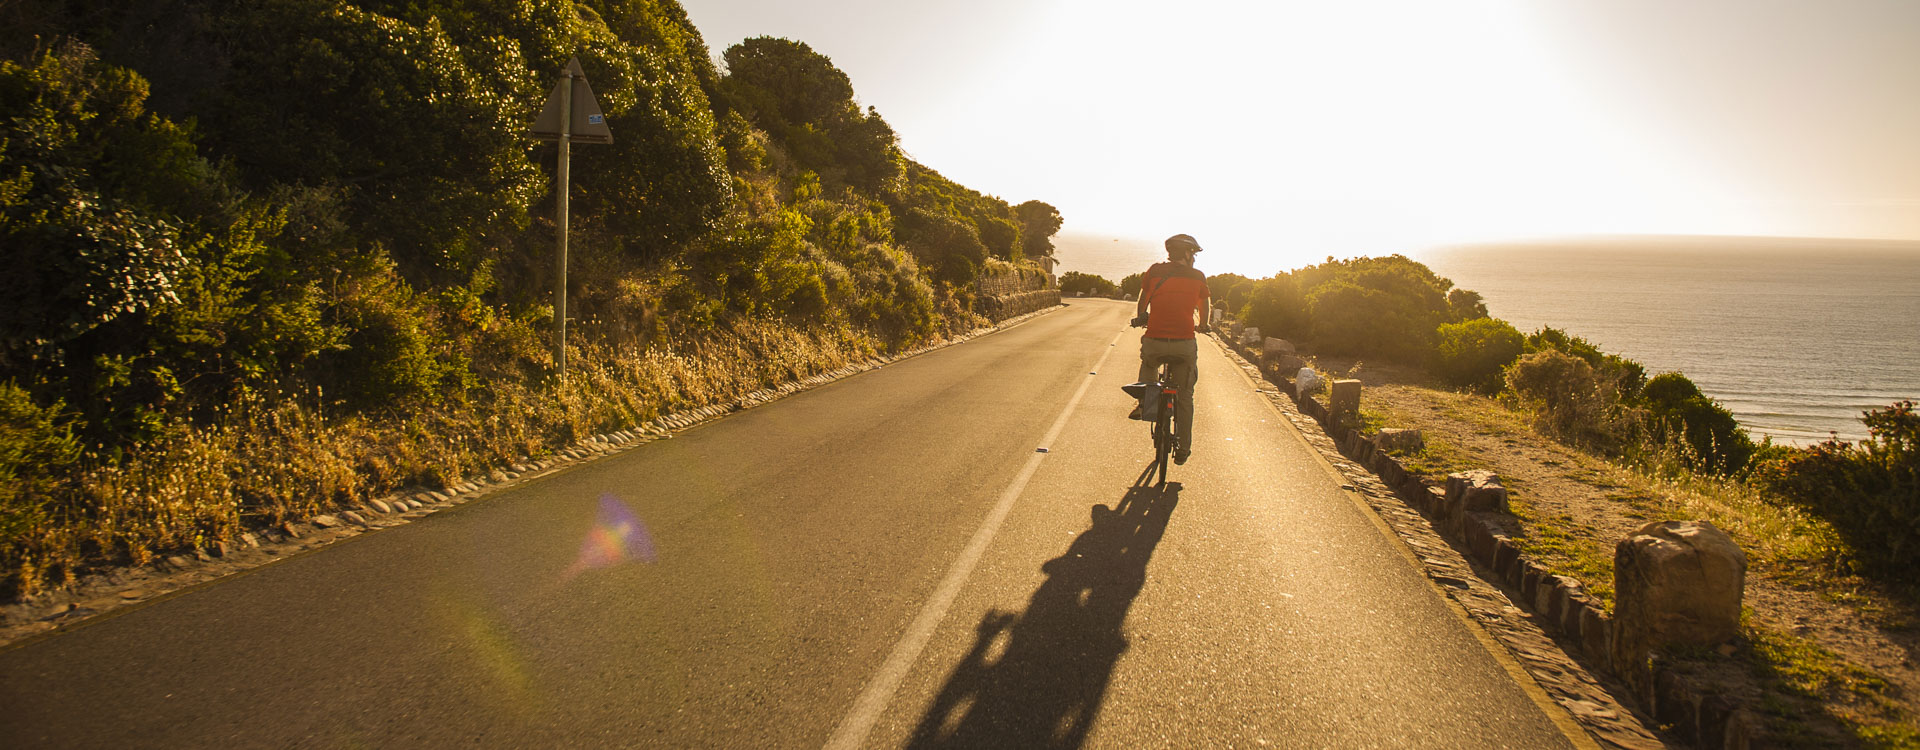 E-Bike Ratgeber - Pedelec Reise in Südafrika - Radfahren auf der Kap-Halbinsel